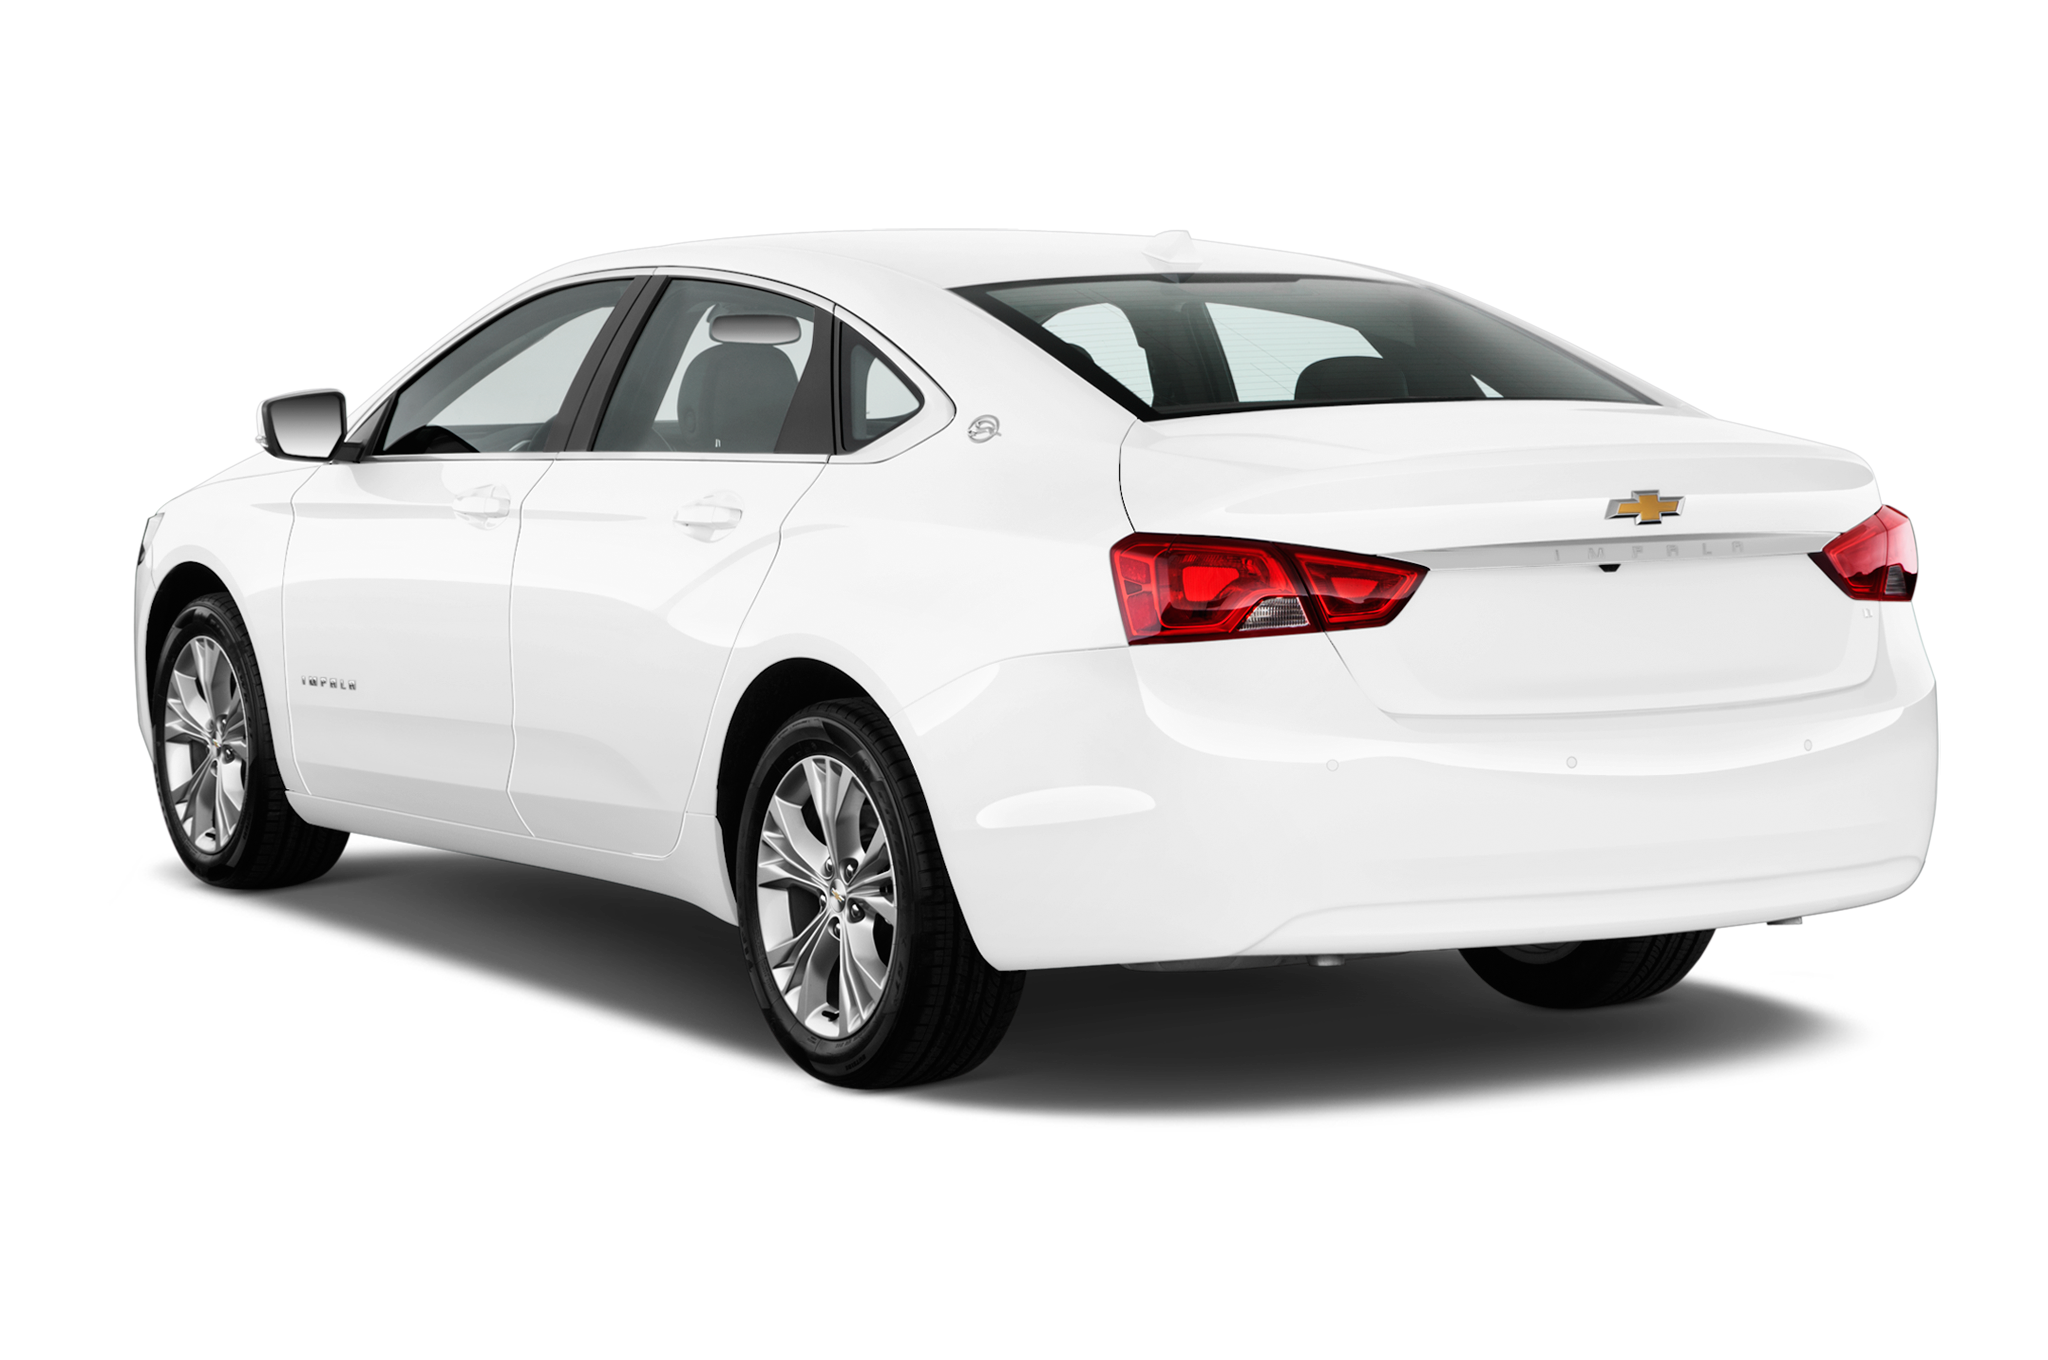 Chevrolet cars png images. Clipart car tavera